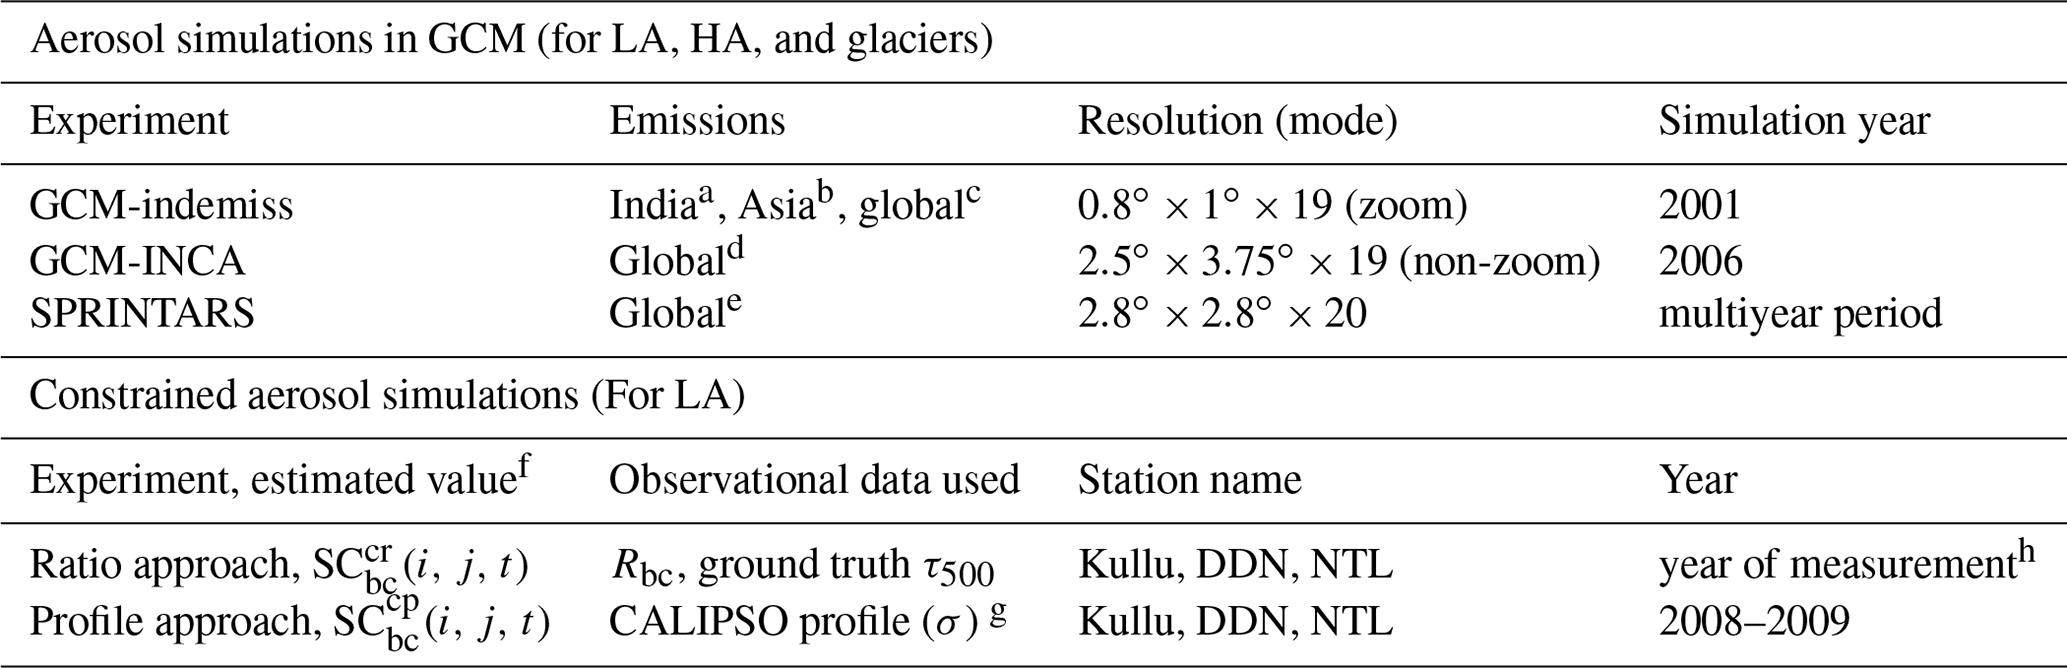 ACP - Simulations of black carbon (BC) aerosol impact over Hindu